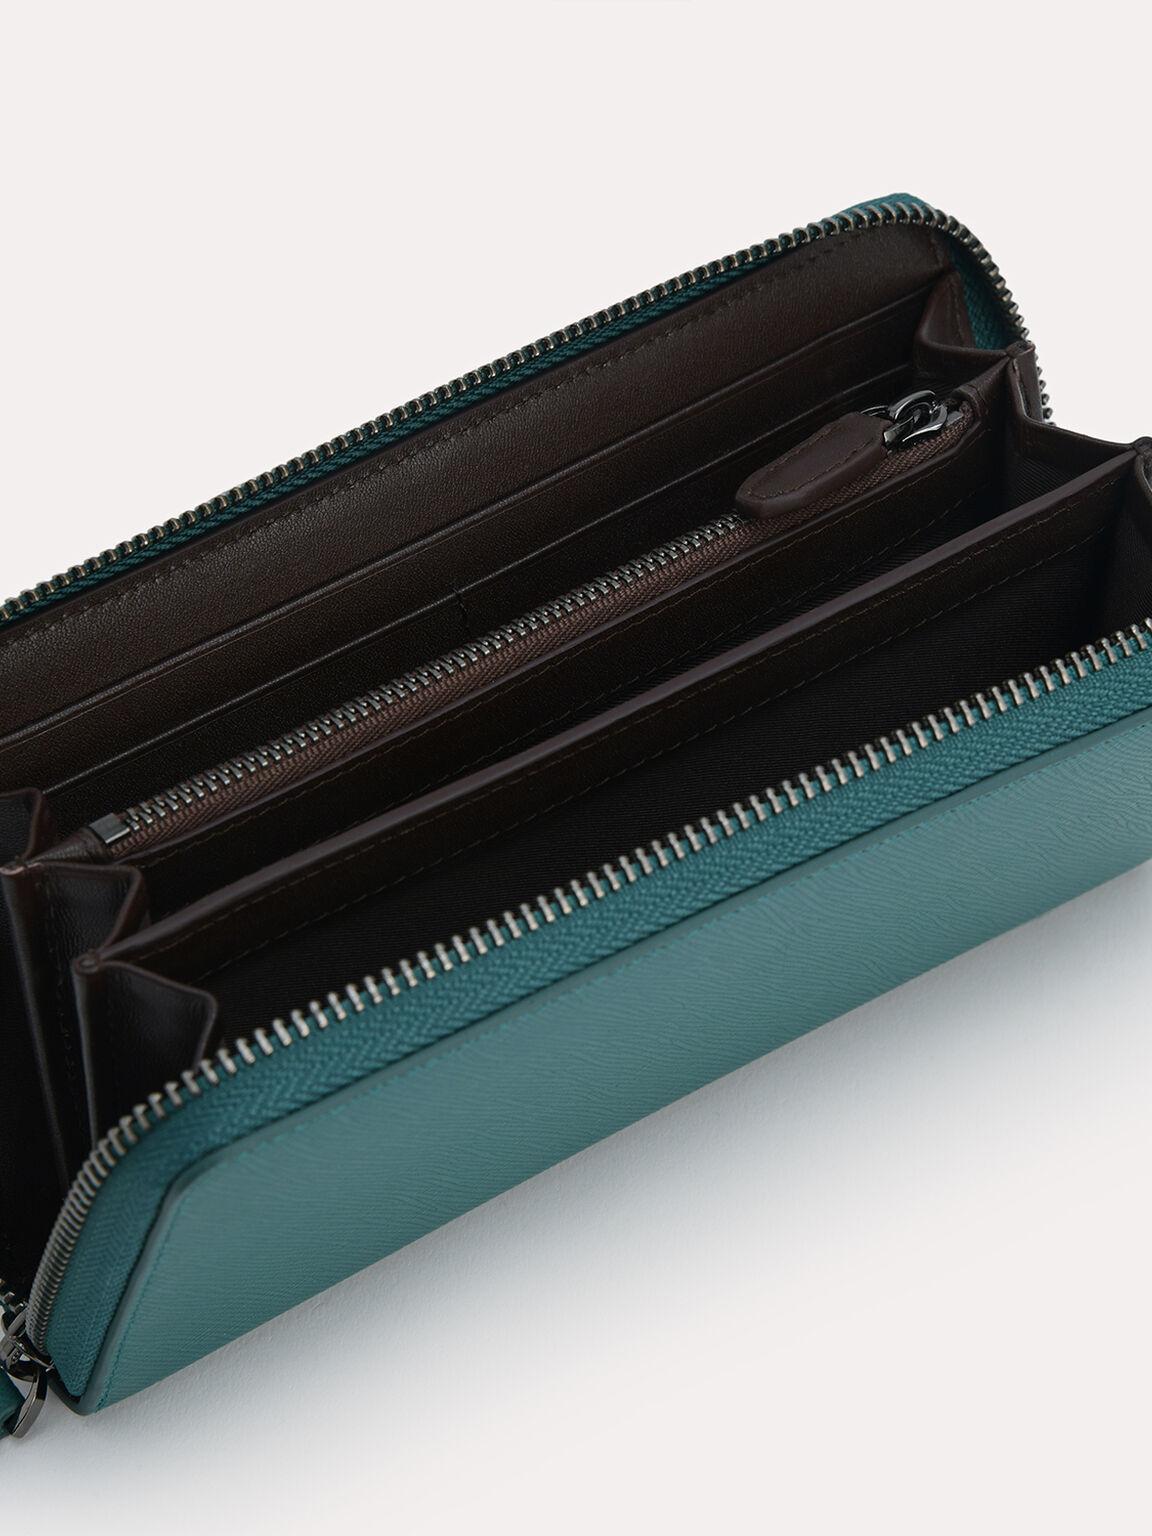 Long Leather Wallet, Dark Green, hi-res